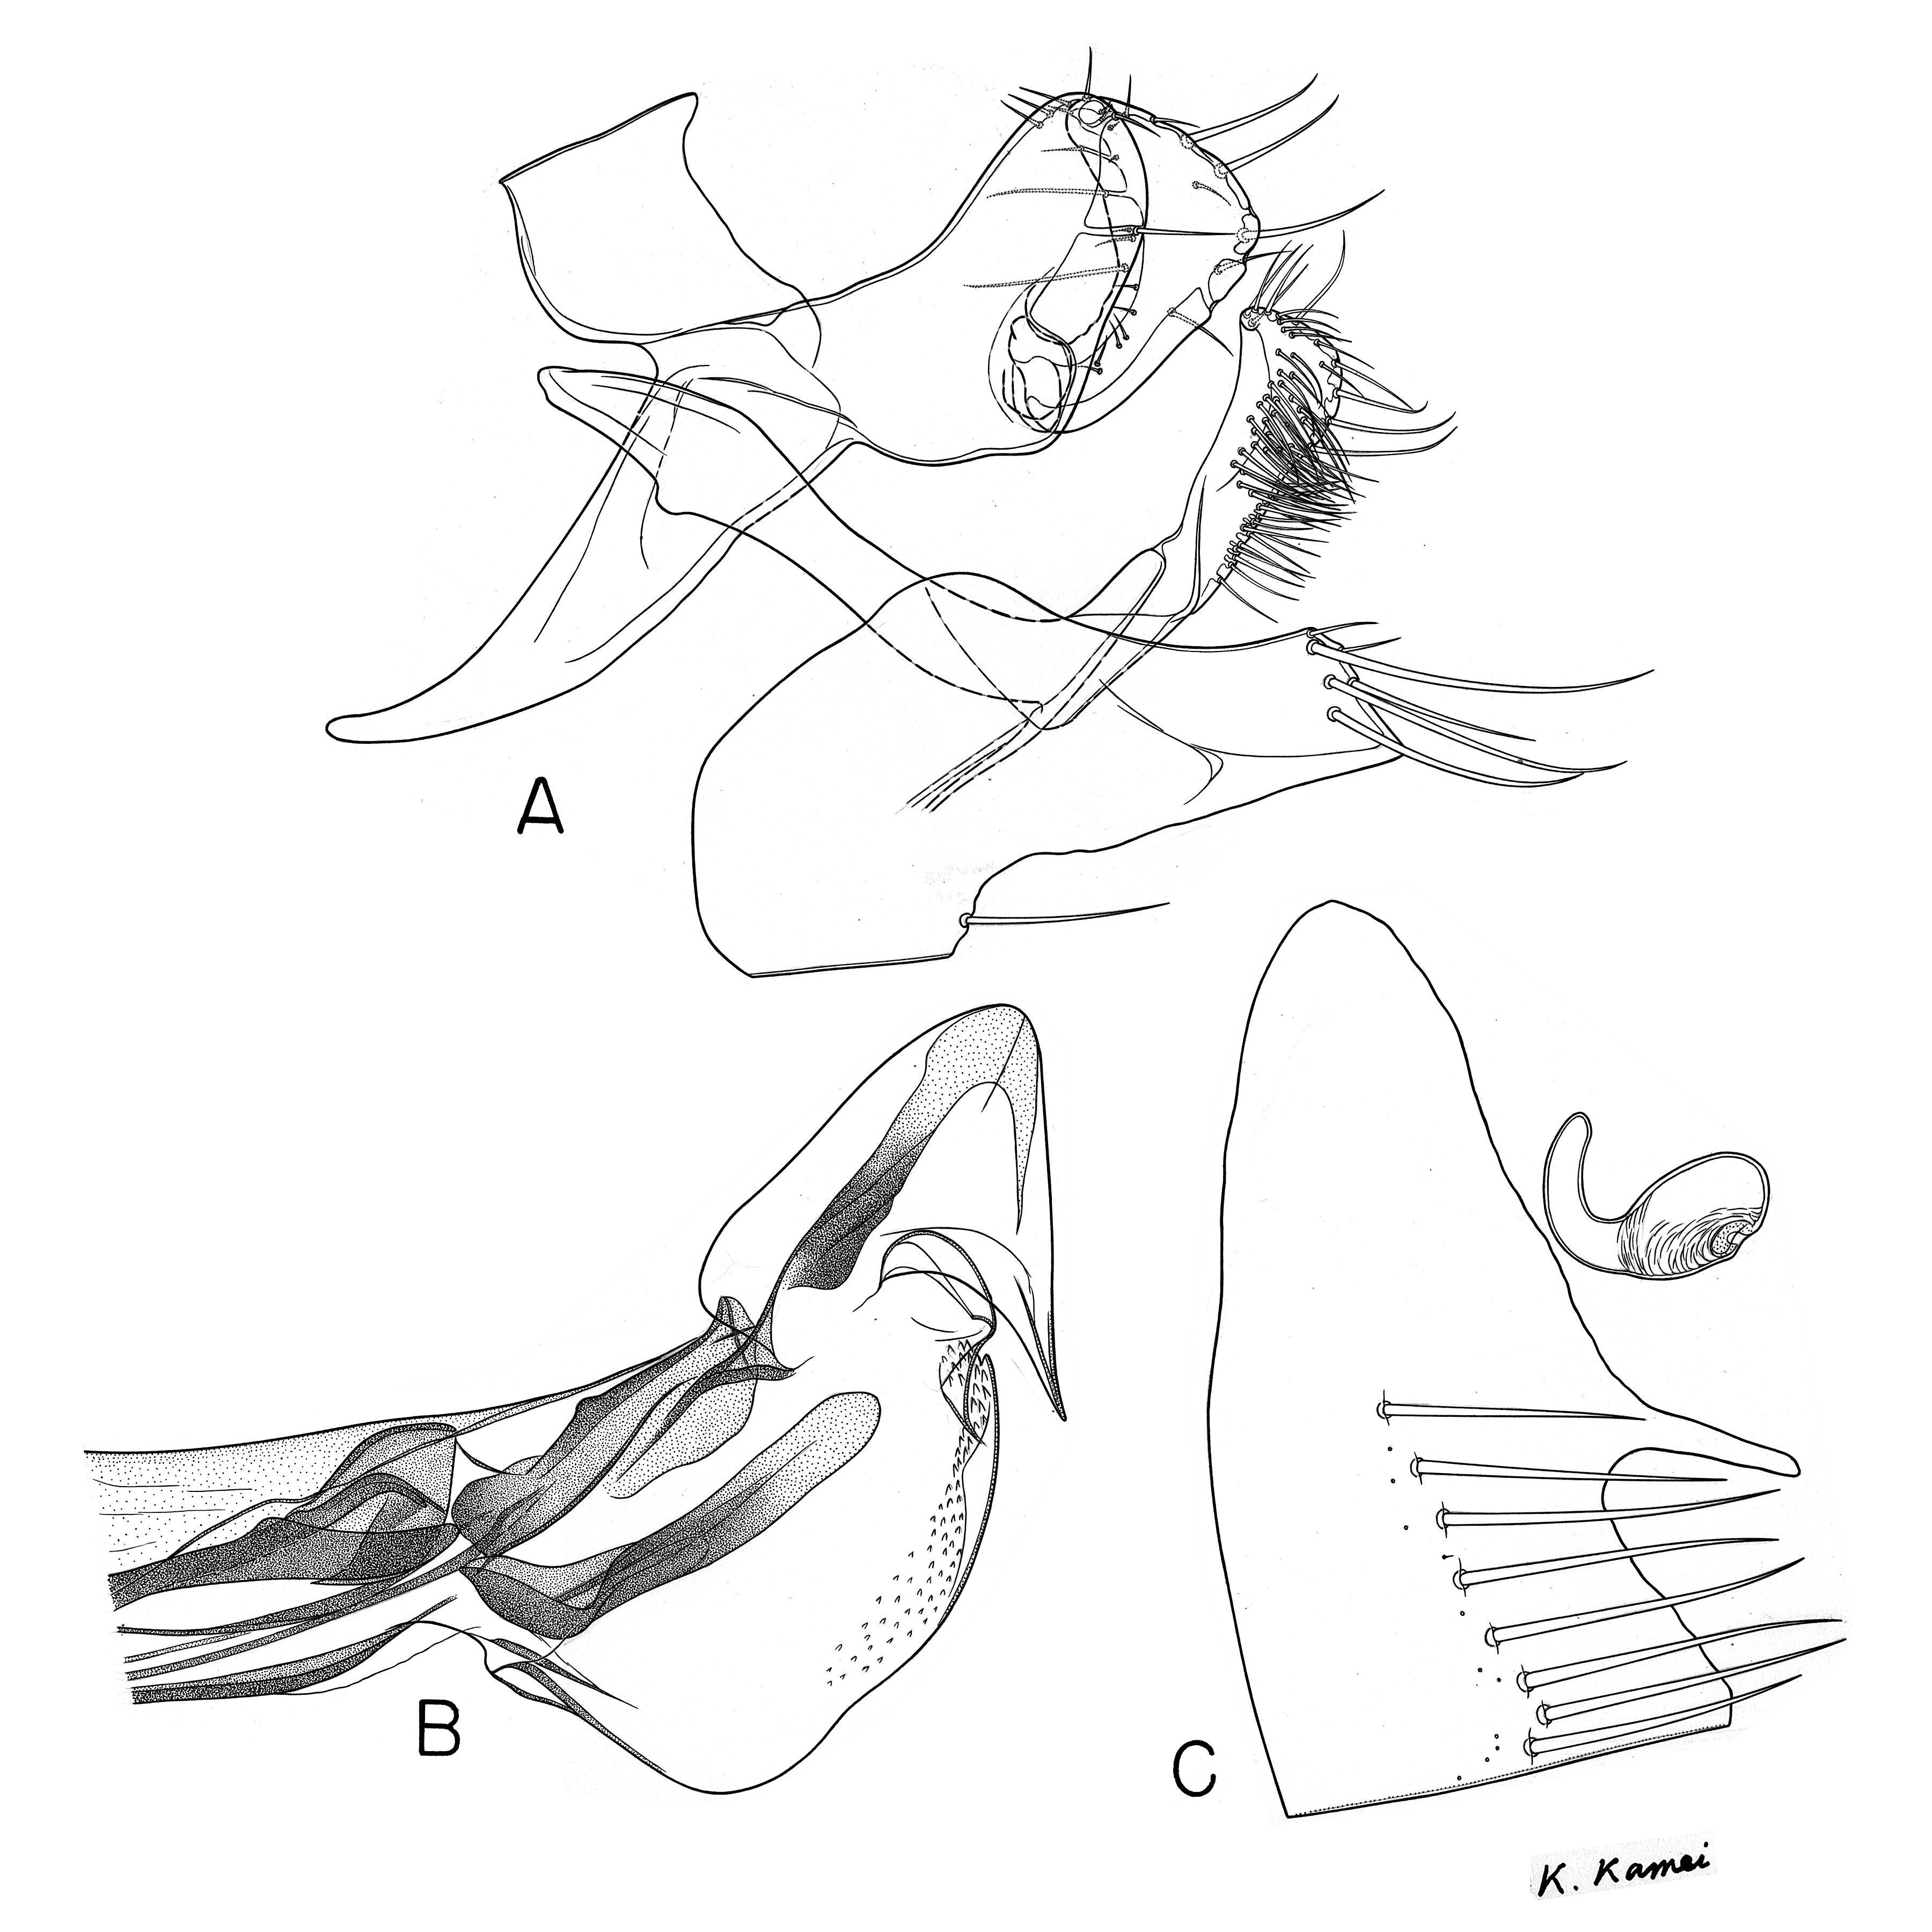 Image of <i>Peromyscopsylla segregata</i> Sakaguti & Jameson 1959